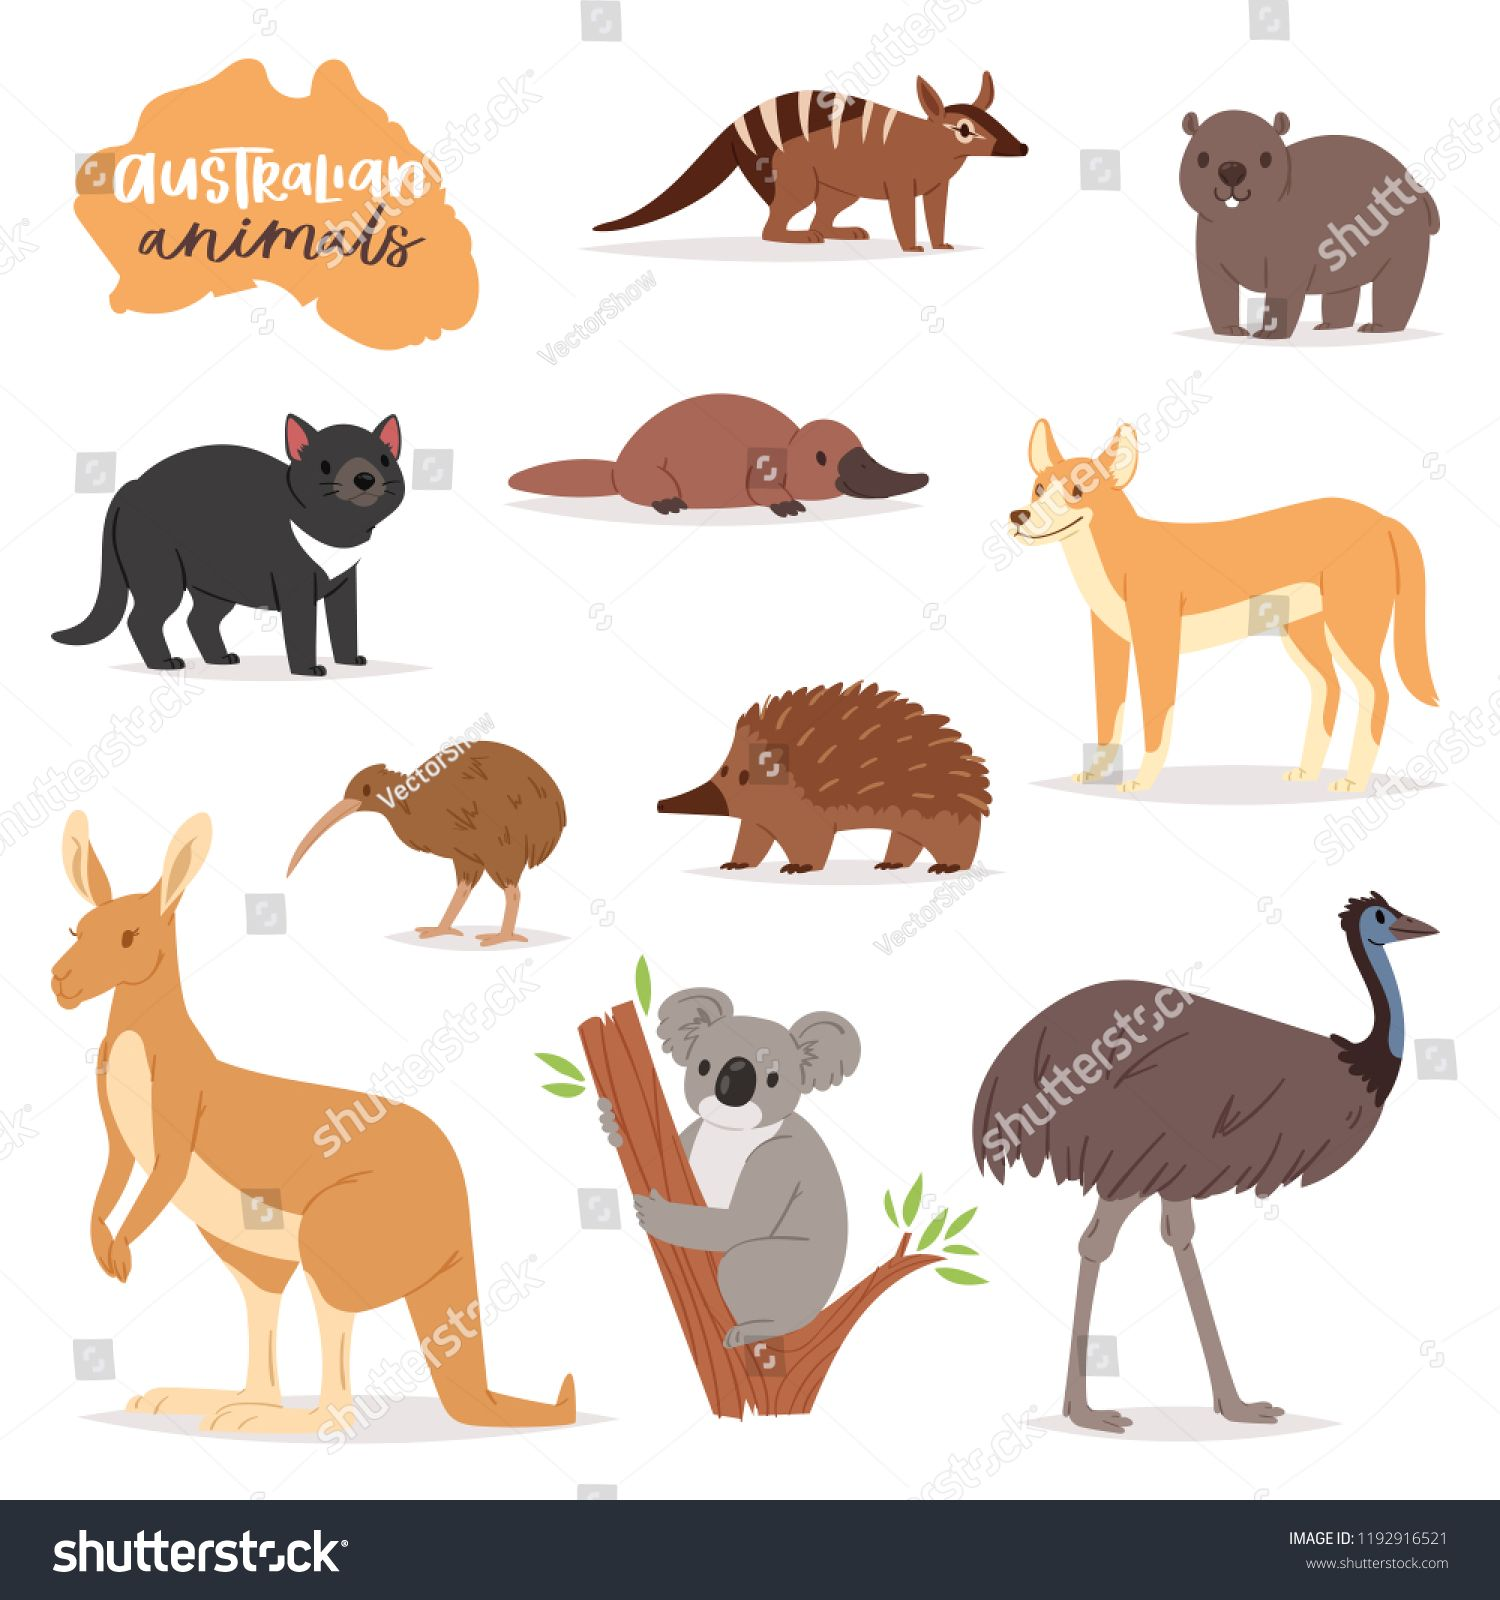 Australian Animals Vector Animalistic Character In Wildlife Australia Kangaroo Koala And Platypus Illustration Set Australian Animals Australia Animals Animals